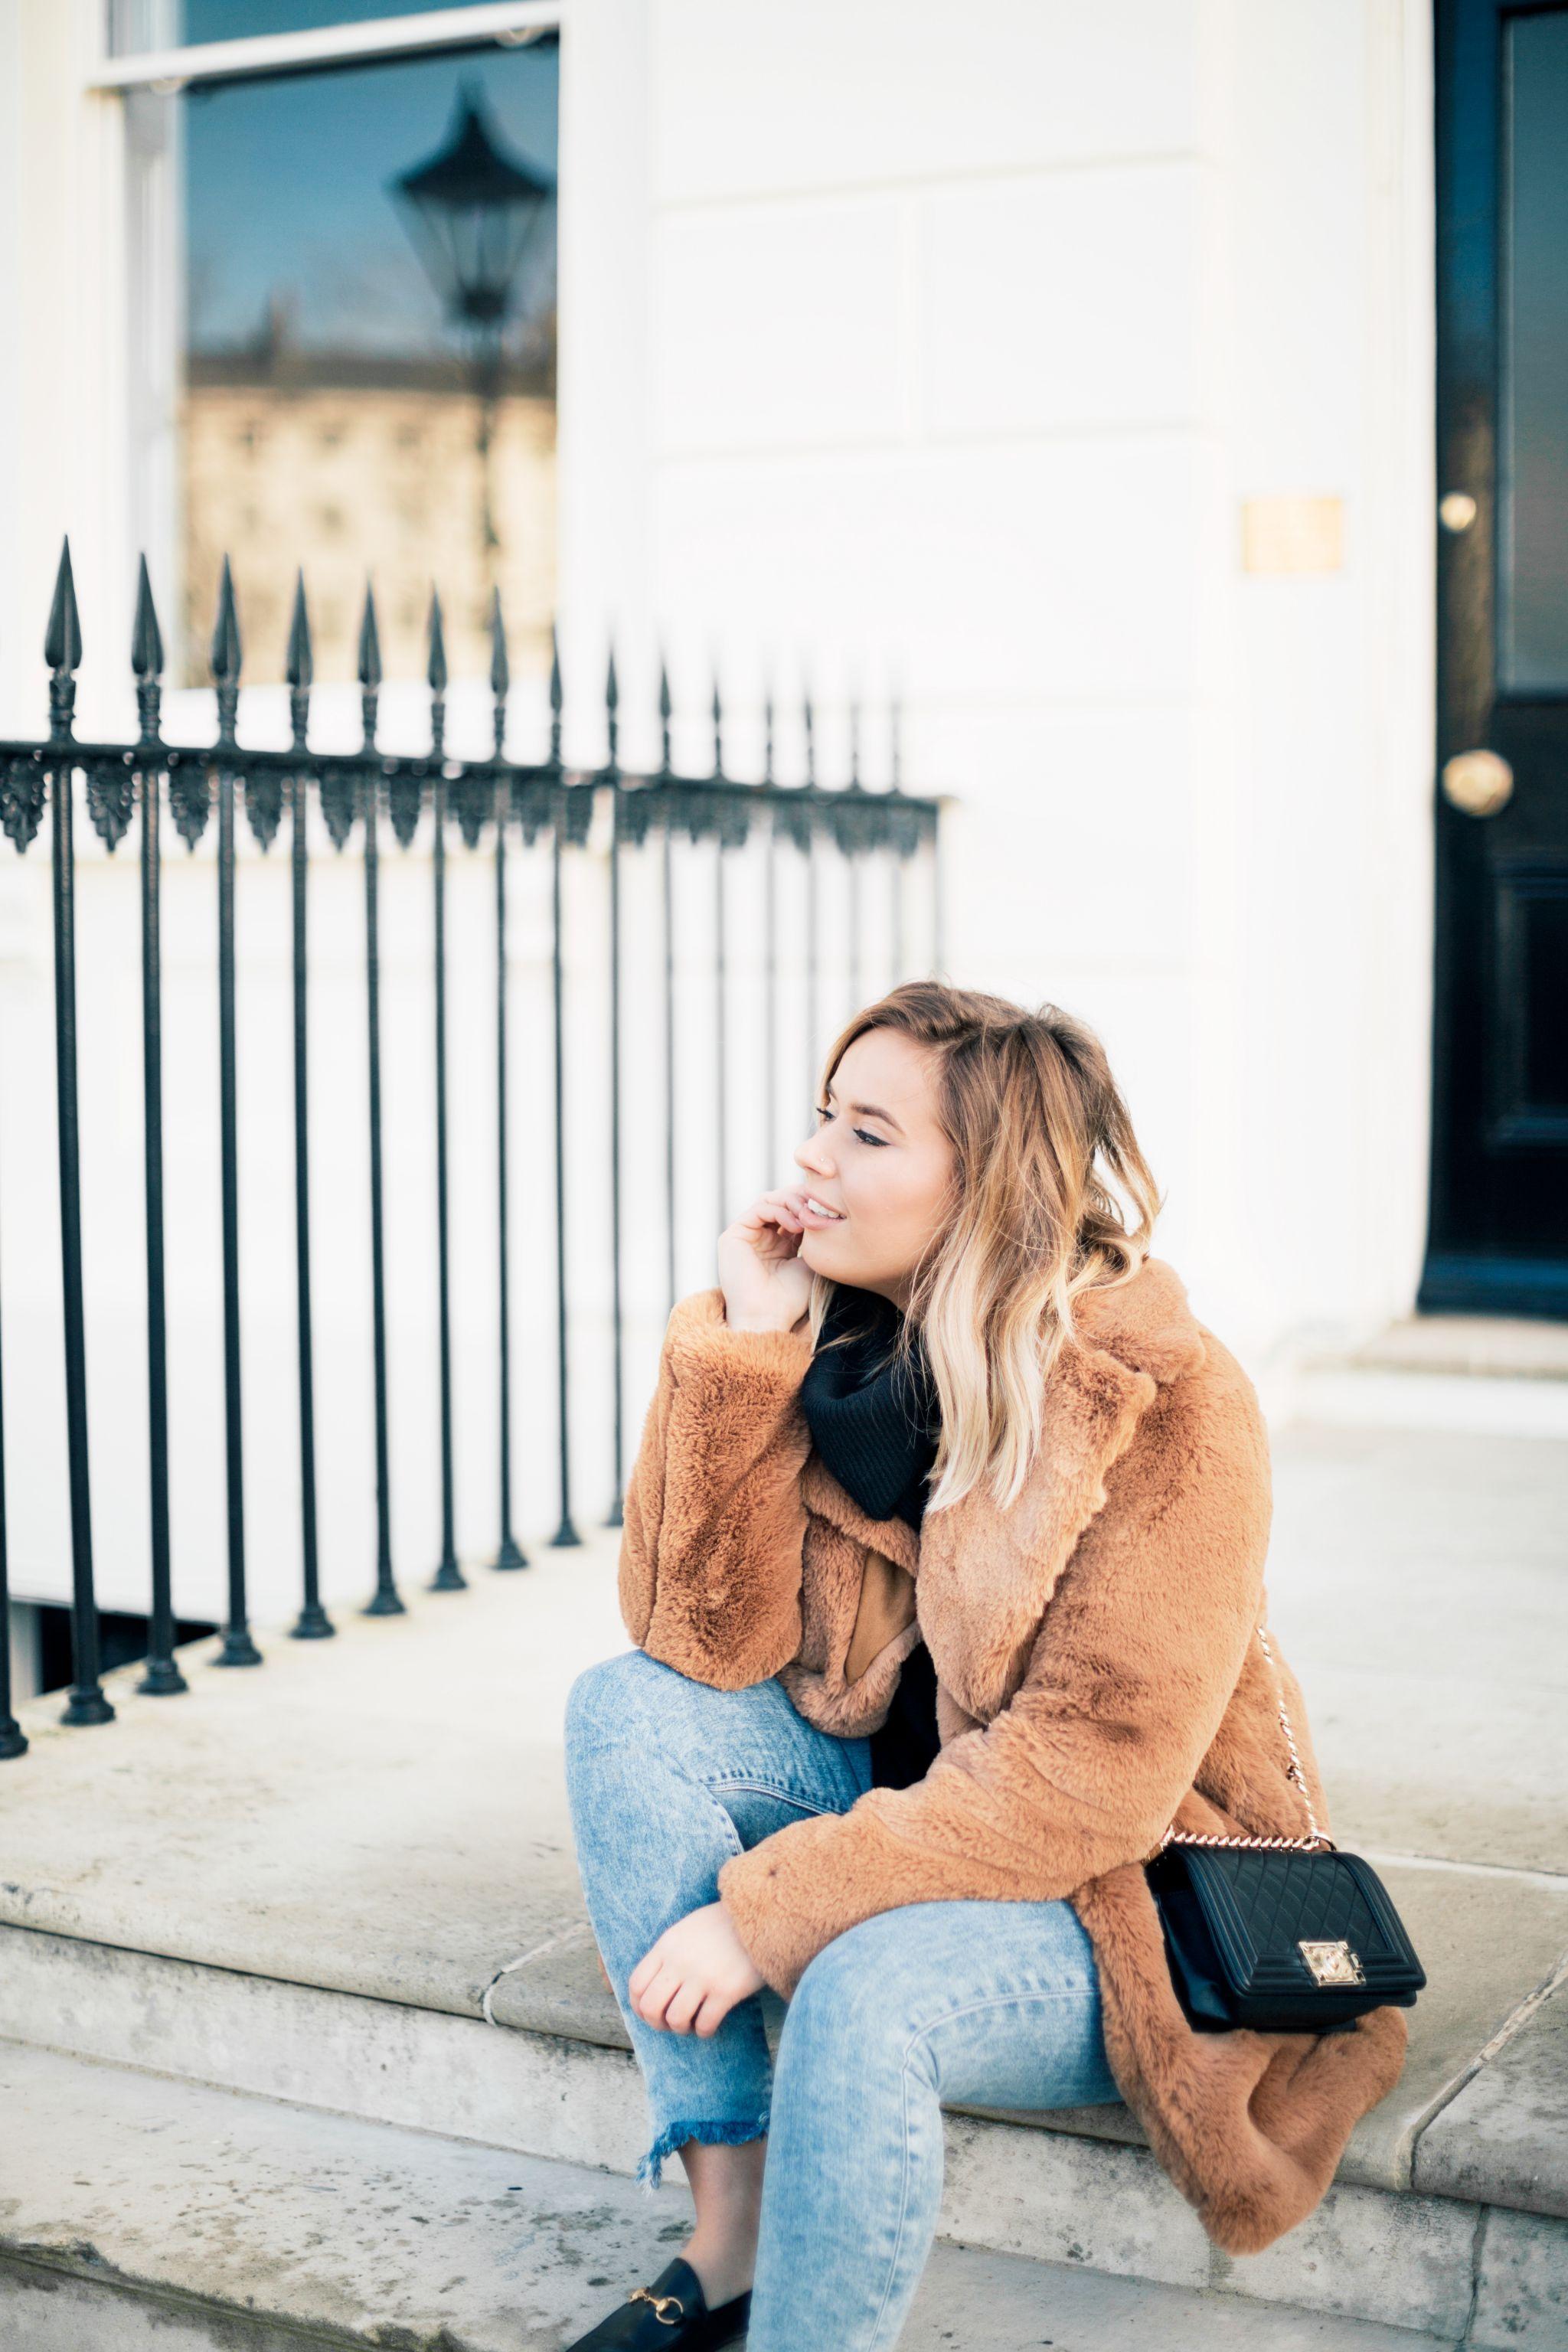 suzie-hello-october-teddy-coat-winter-outfit-chanel-bag-december-2017-22